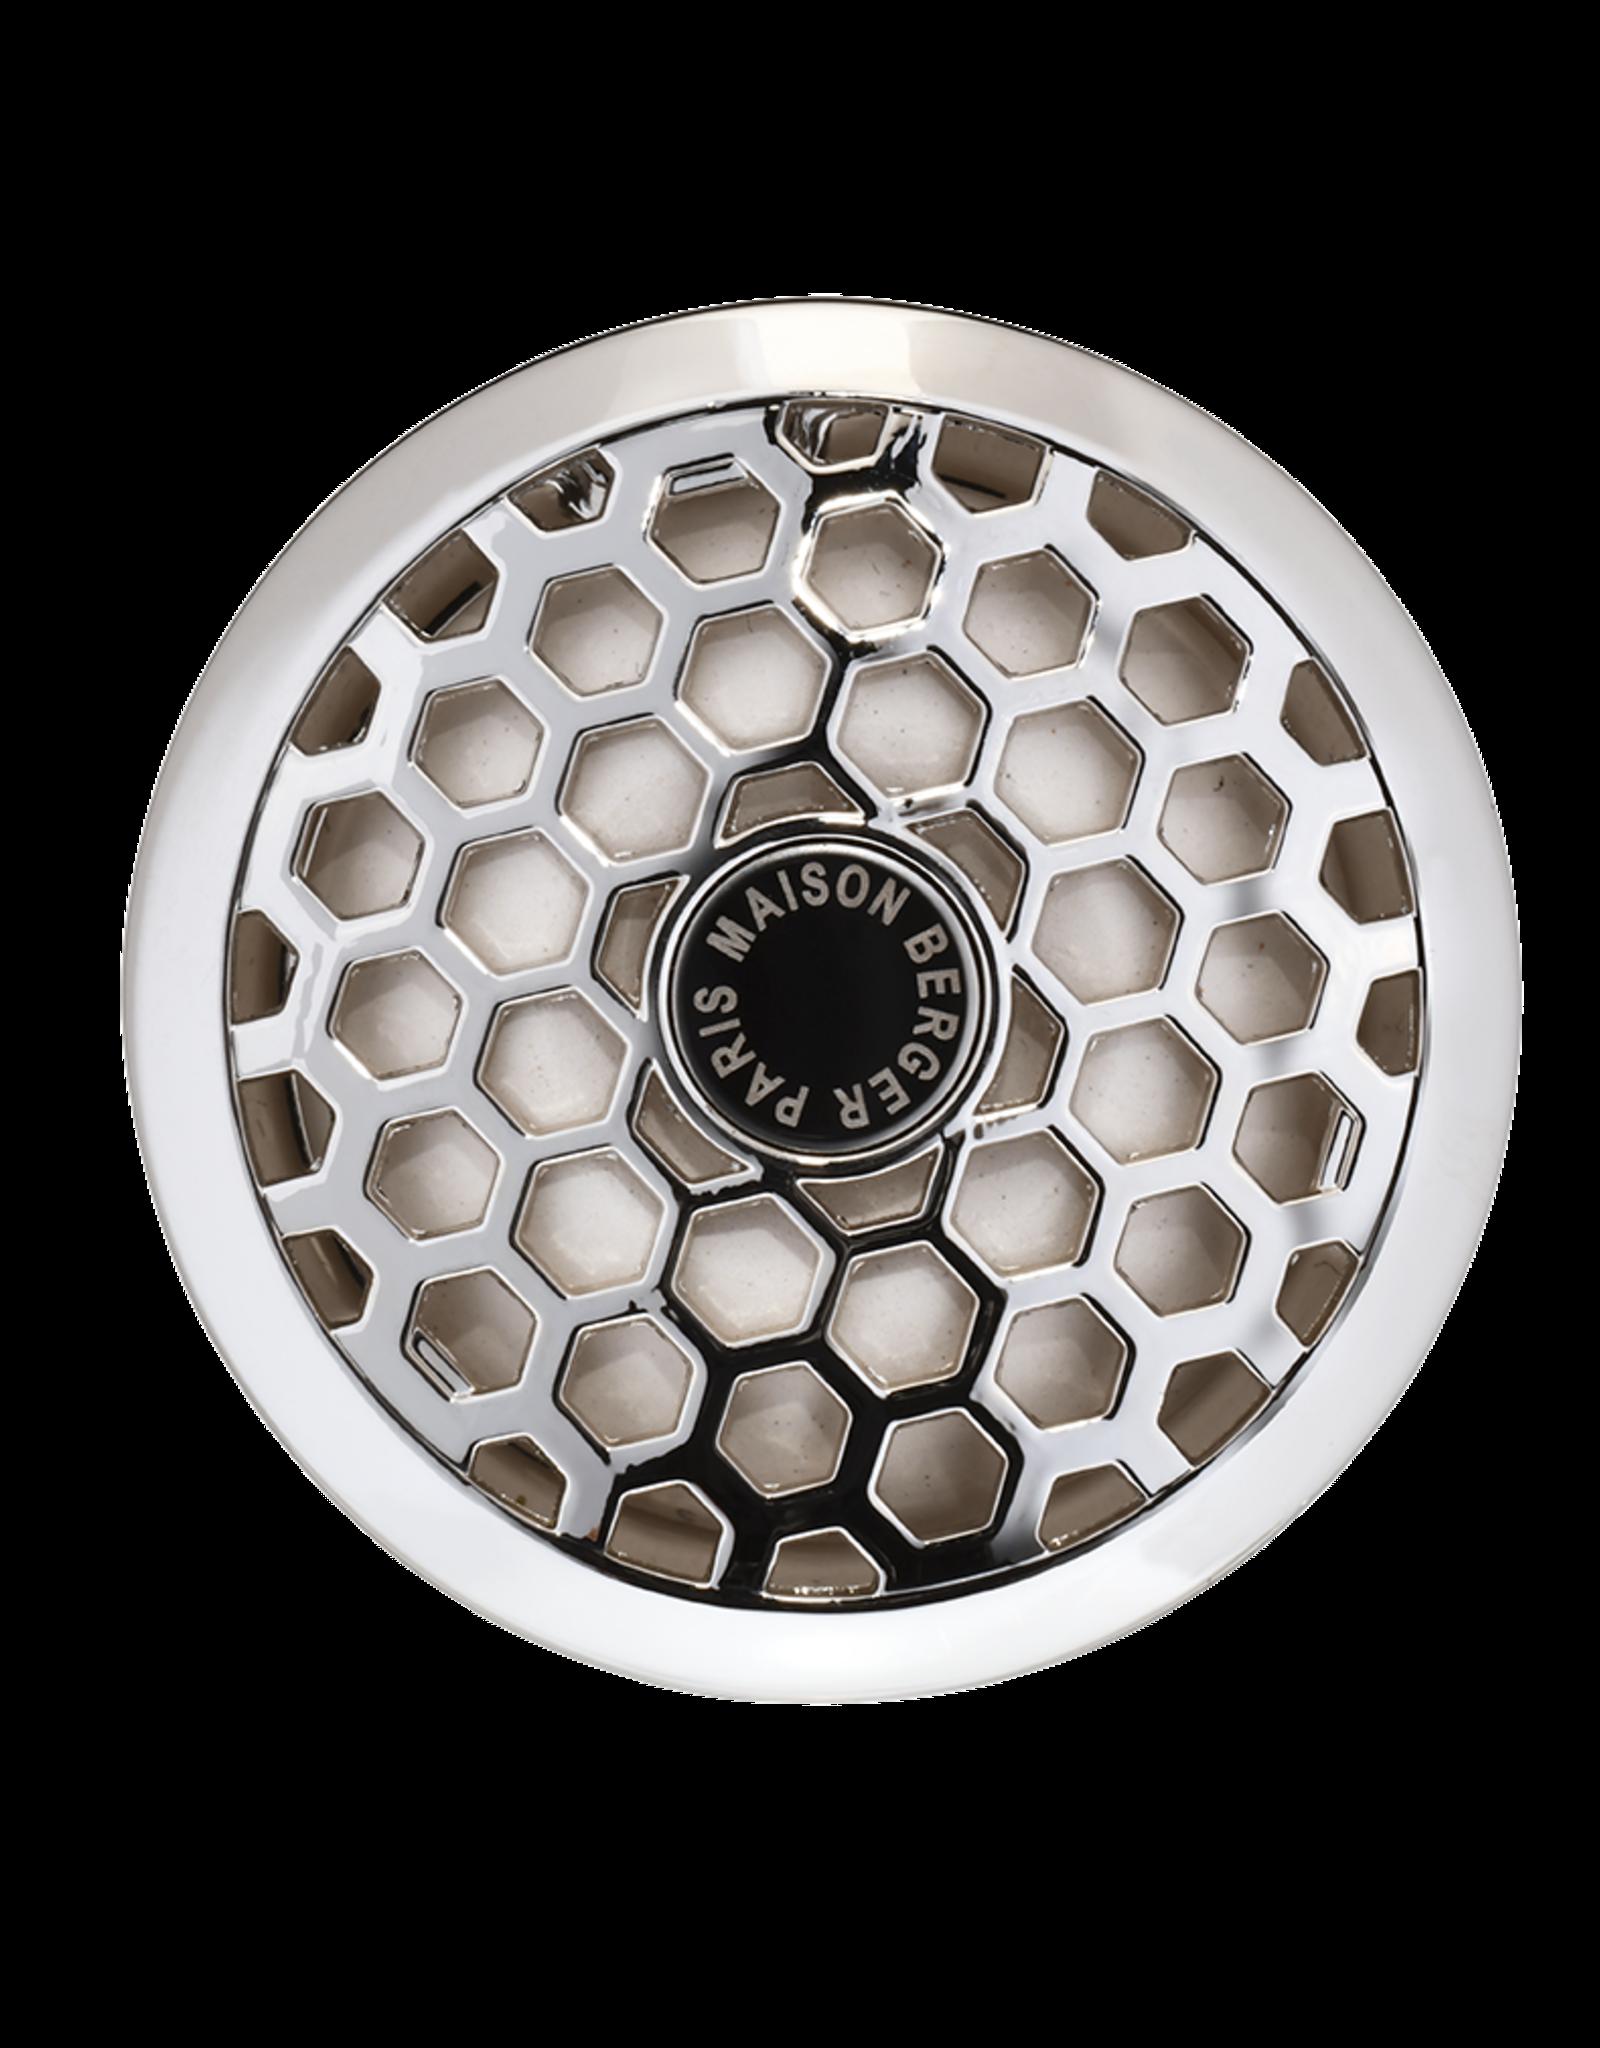 Maison Berger Auto Diffuser - Honey Comb Silver